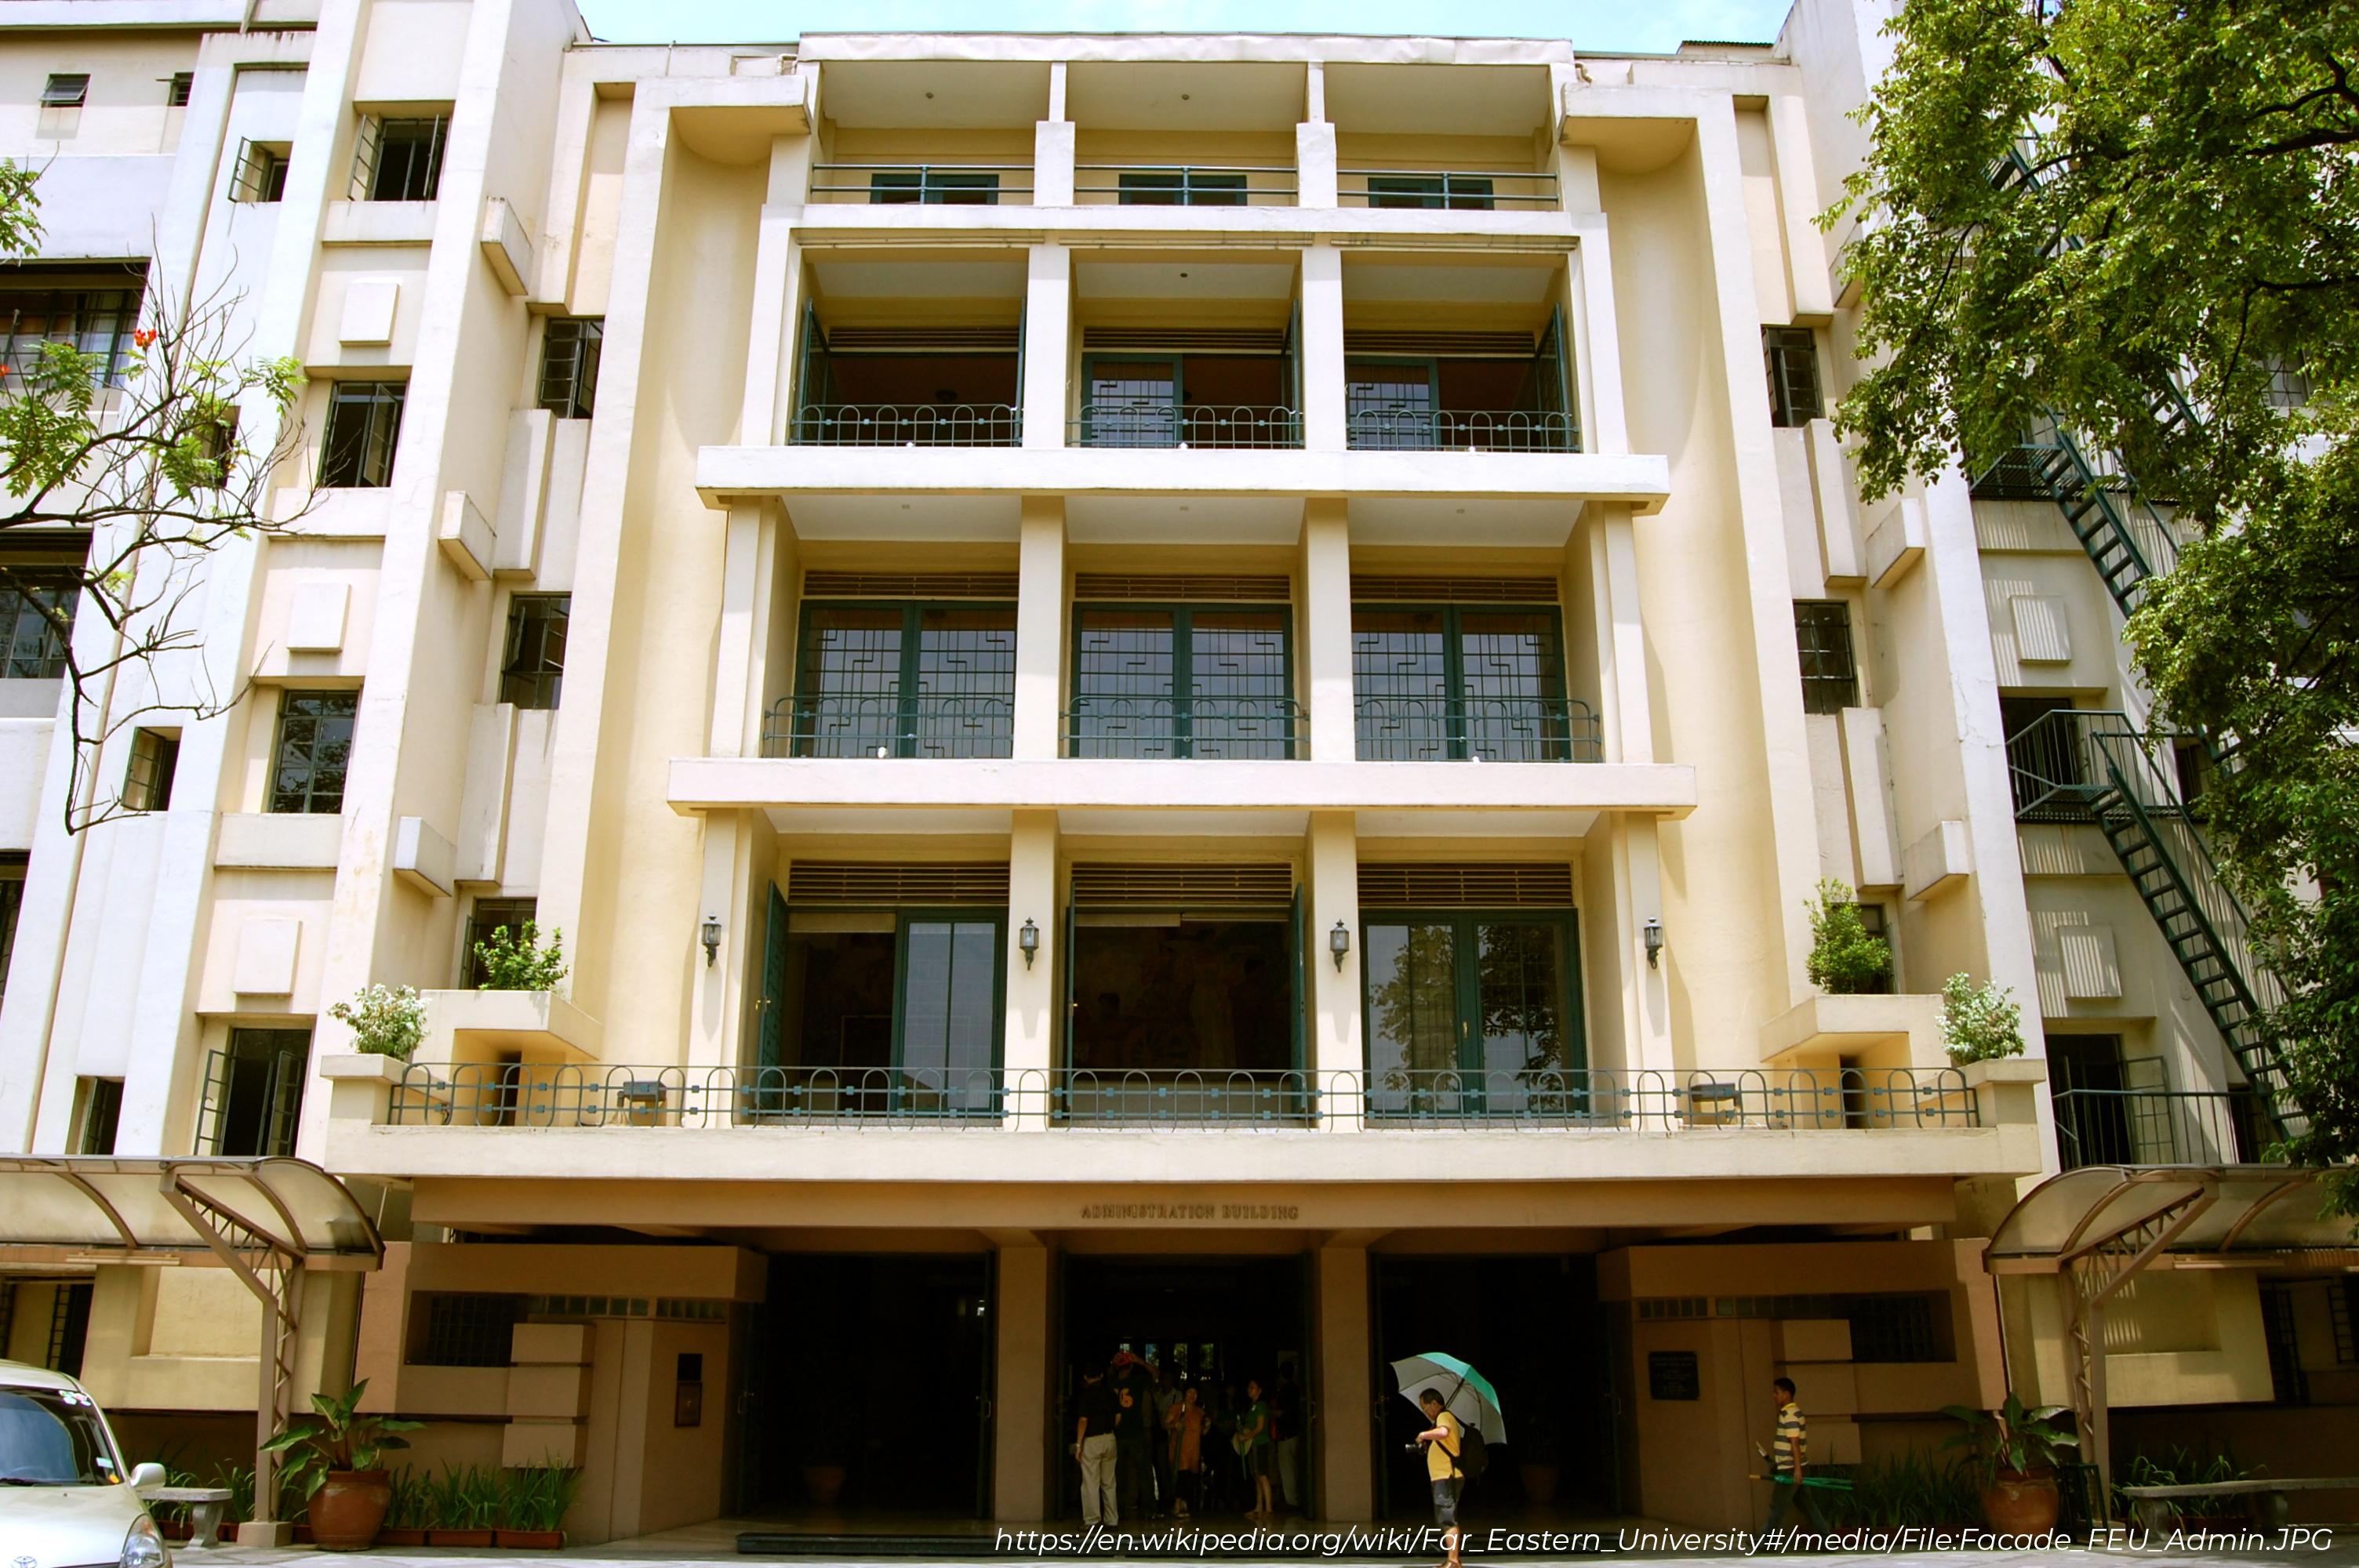 feu (far eastern university) building